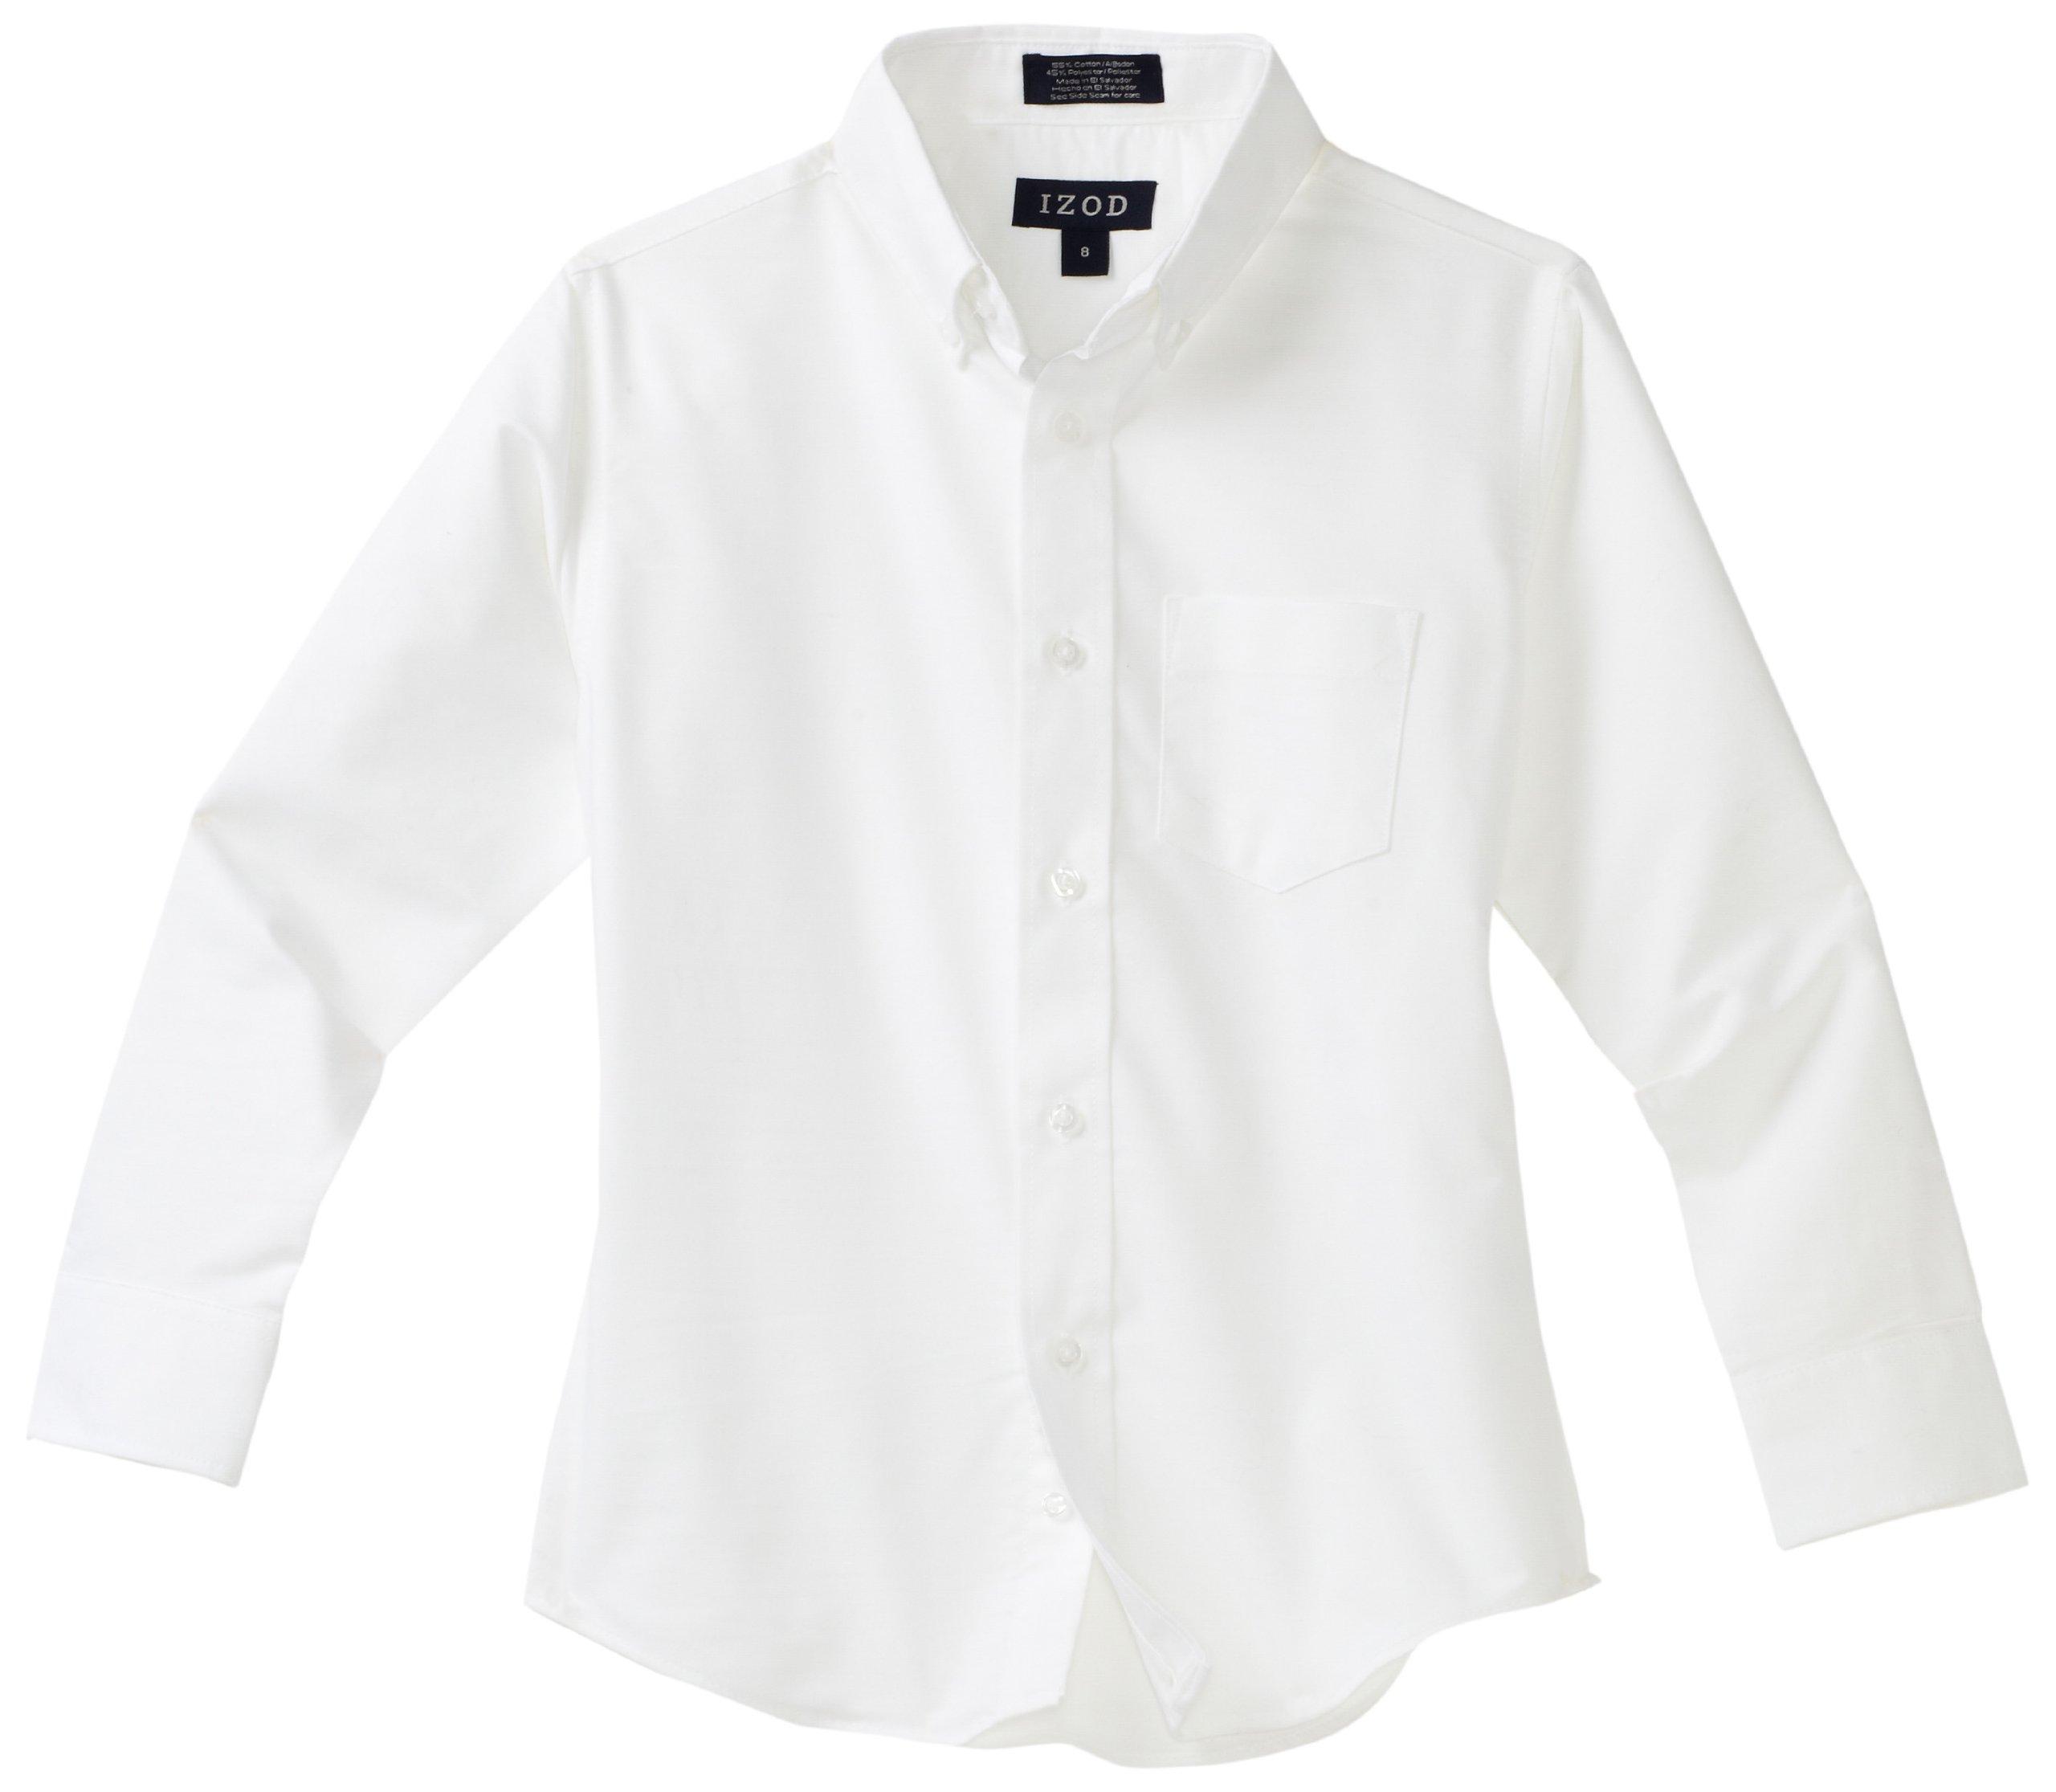 IZOD Kids Big Boys' Long Sleeve Oxford Shirt, White, 14R